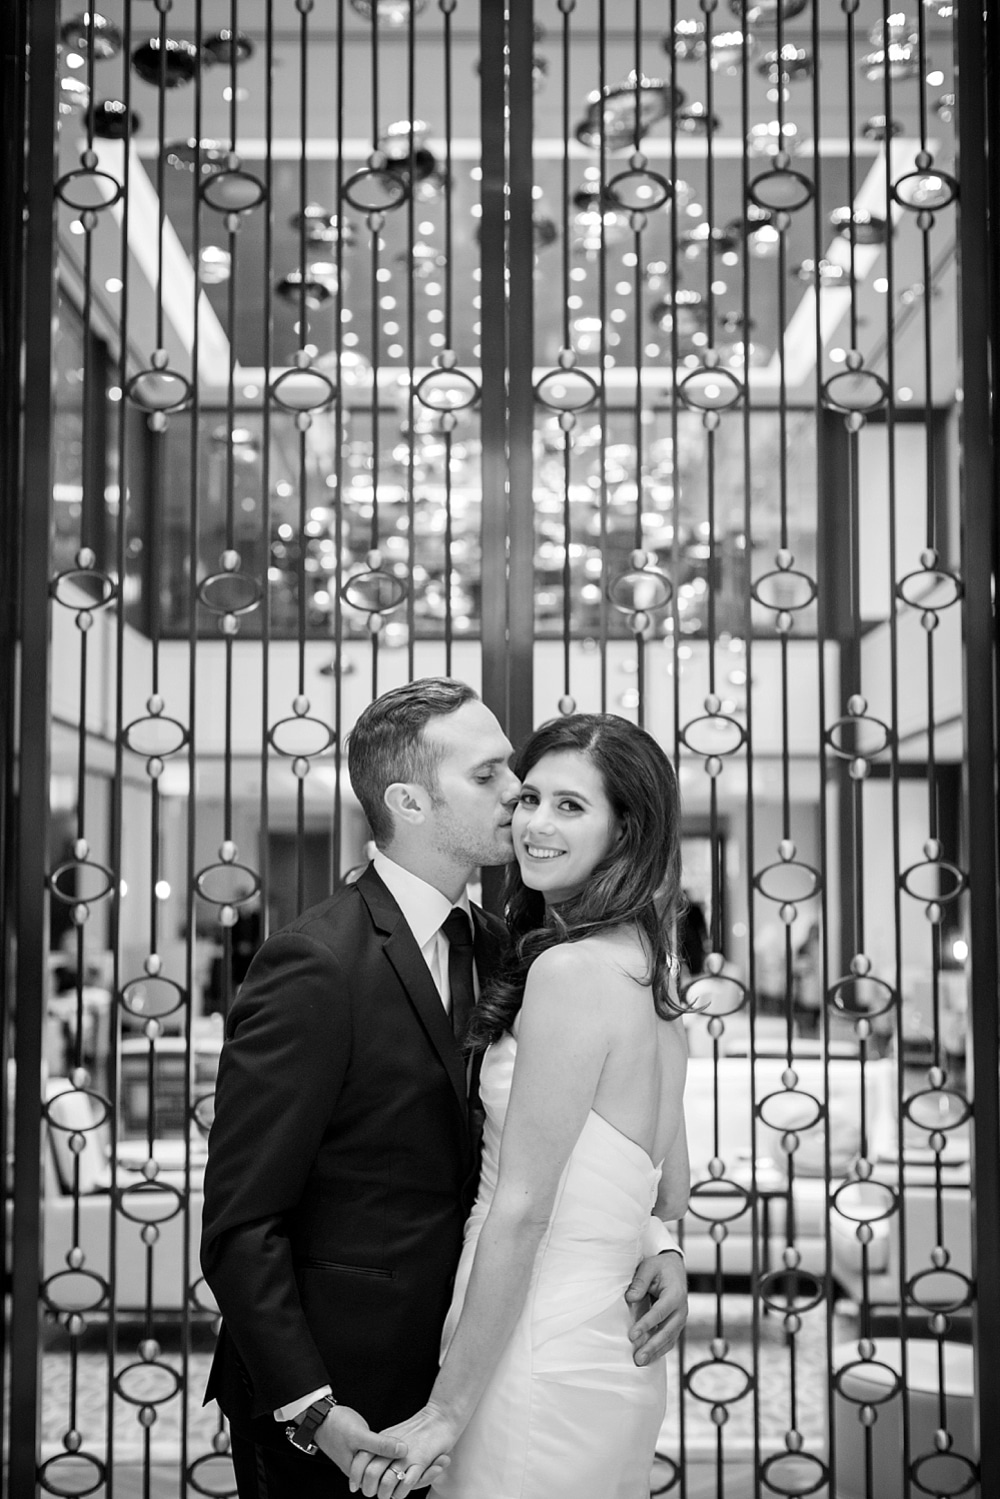 kristin-la-voie-photography-chicago-wedding-photographer-langham-hotel-32